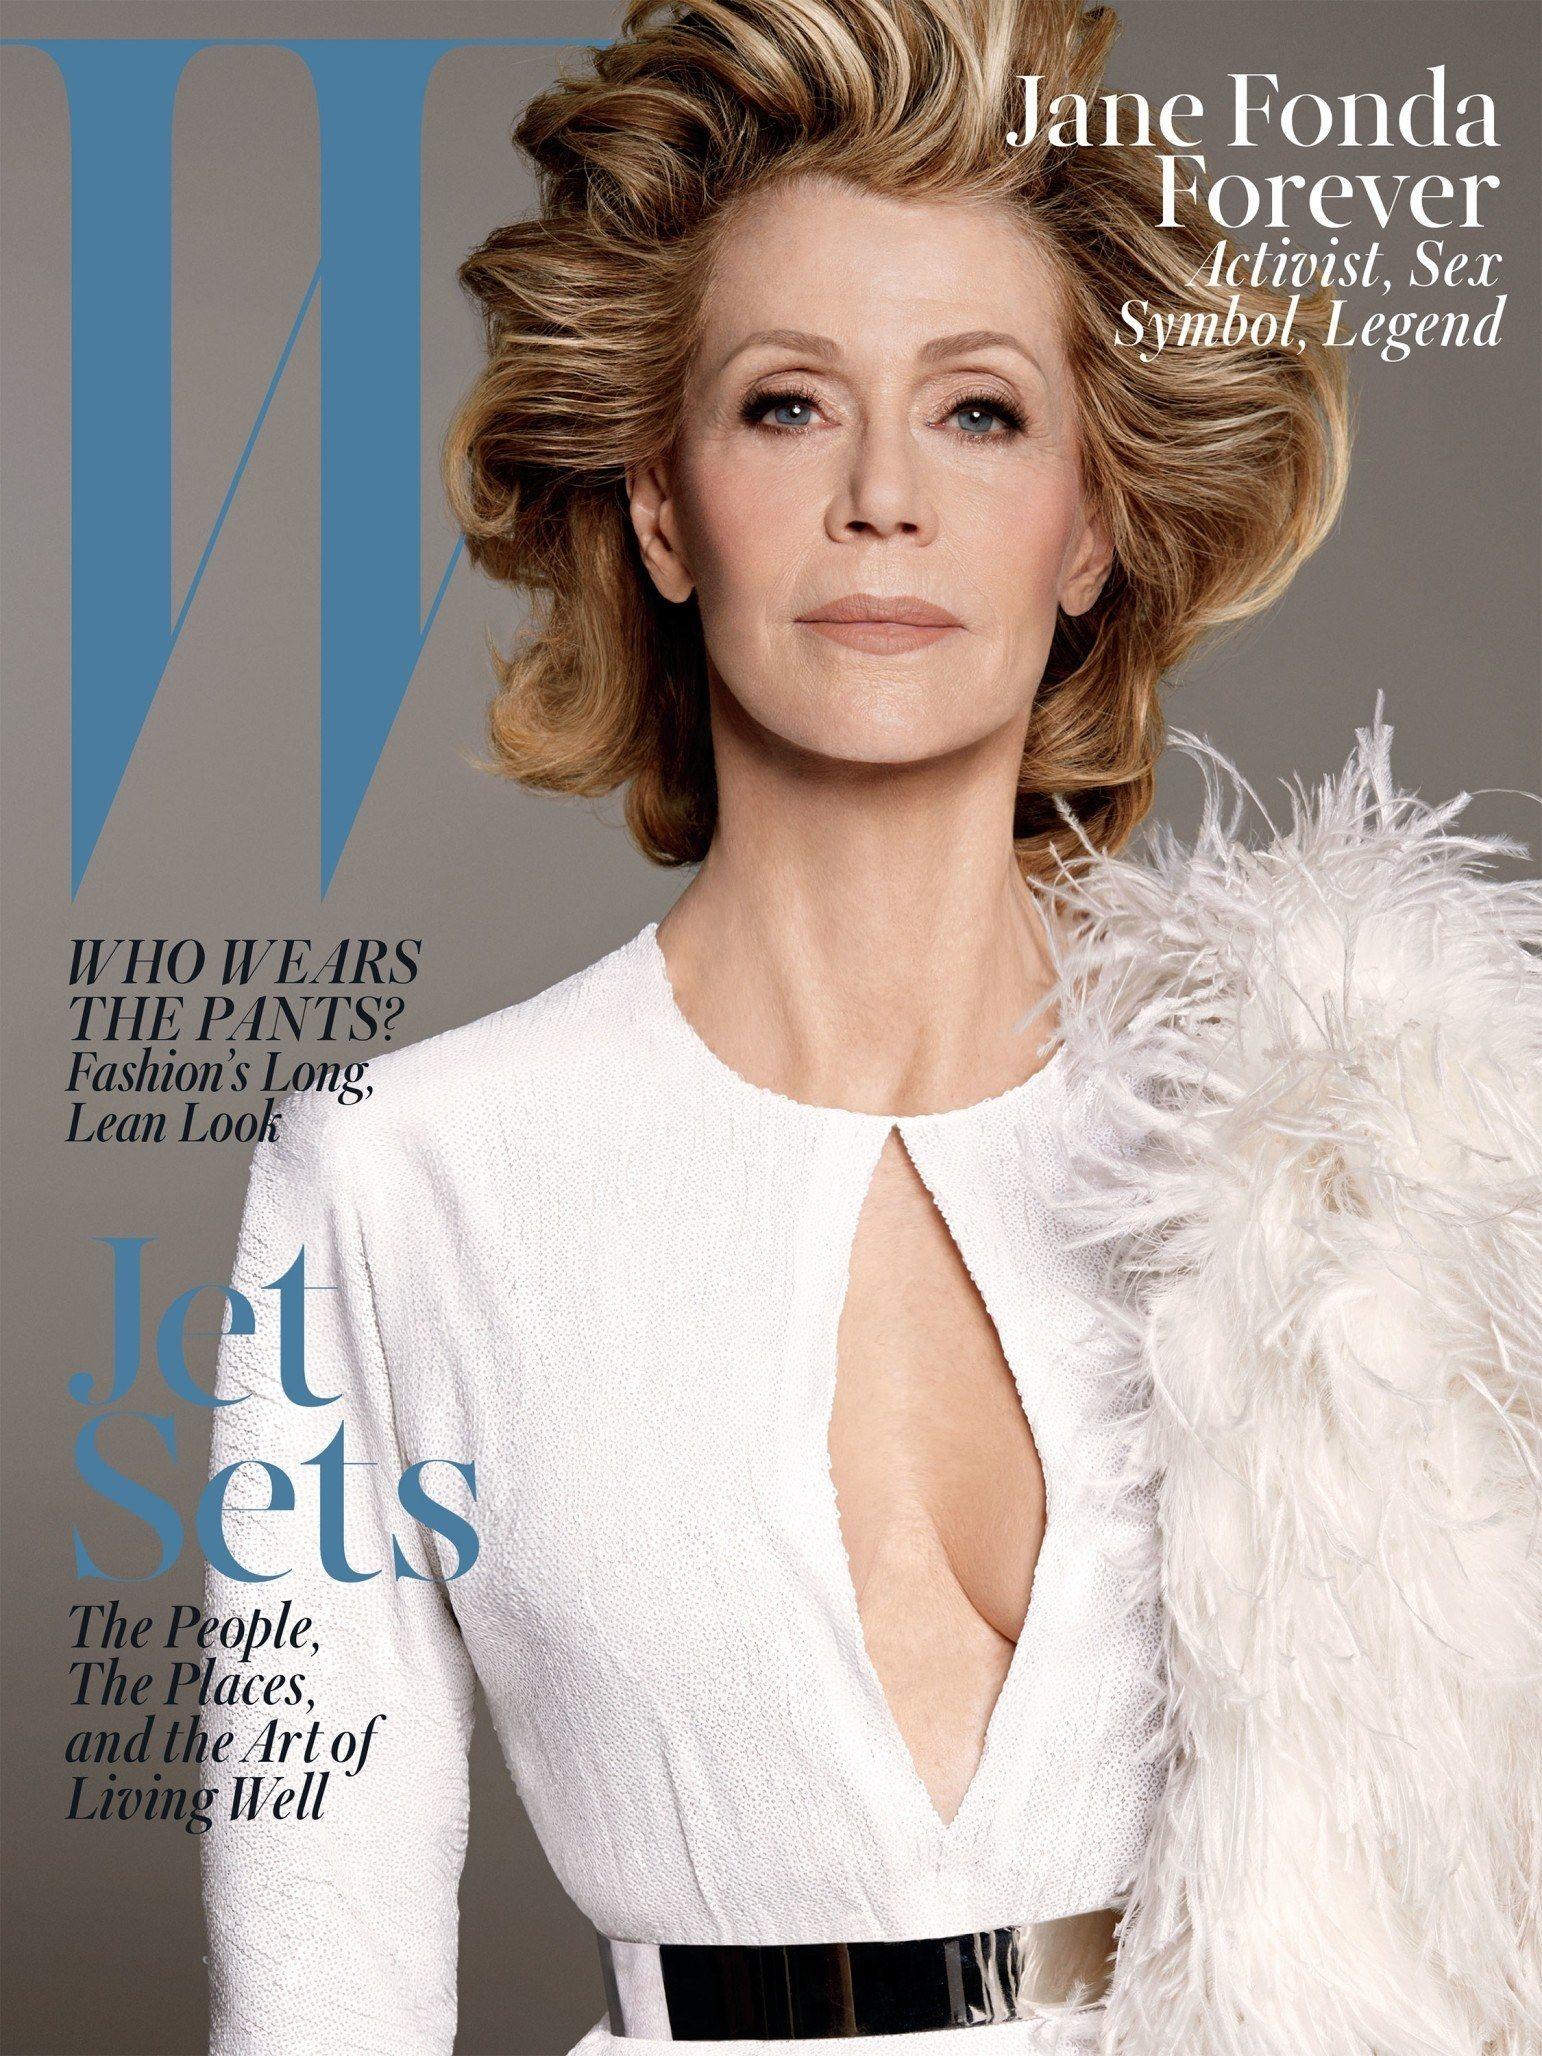 International Women s Day 2018 Janelle Monae Jane Fonda and More